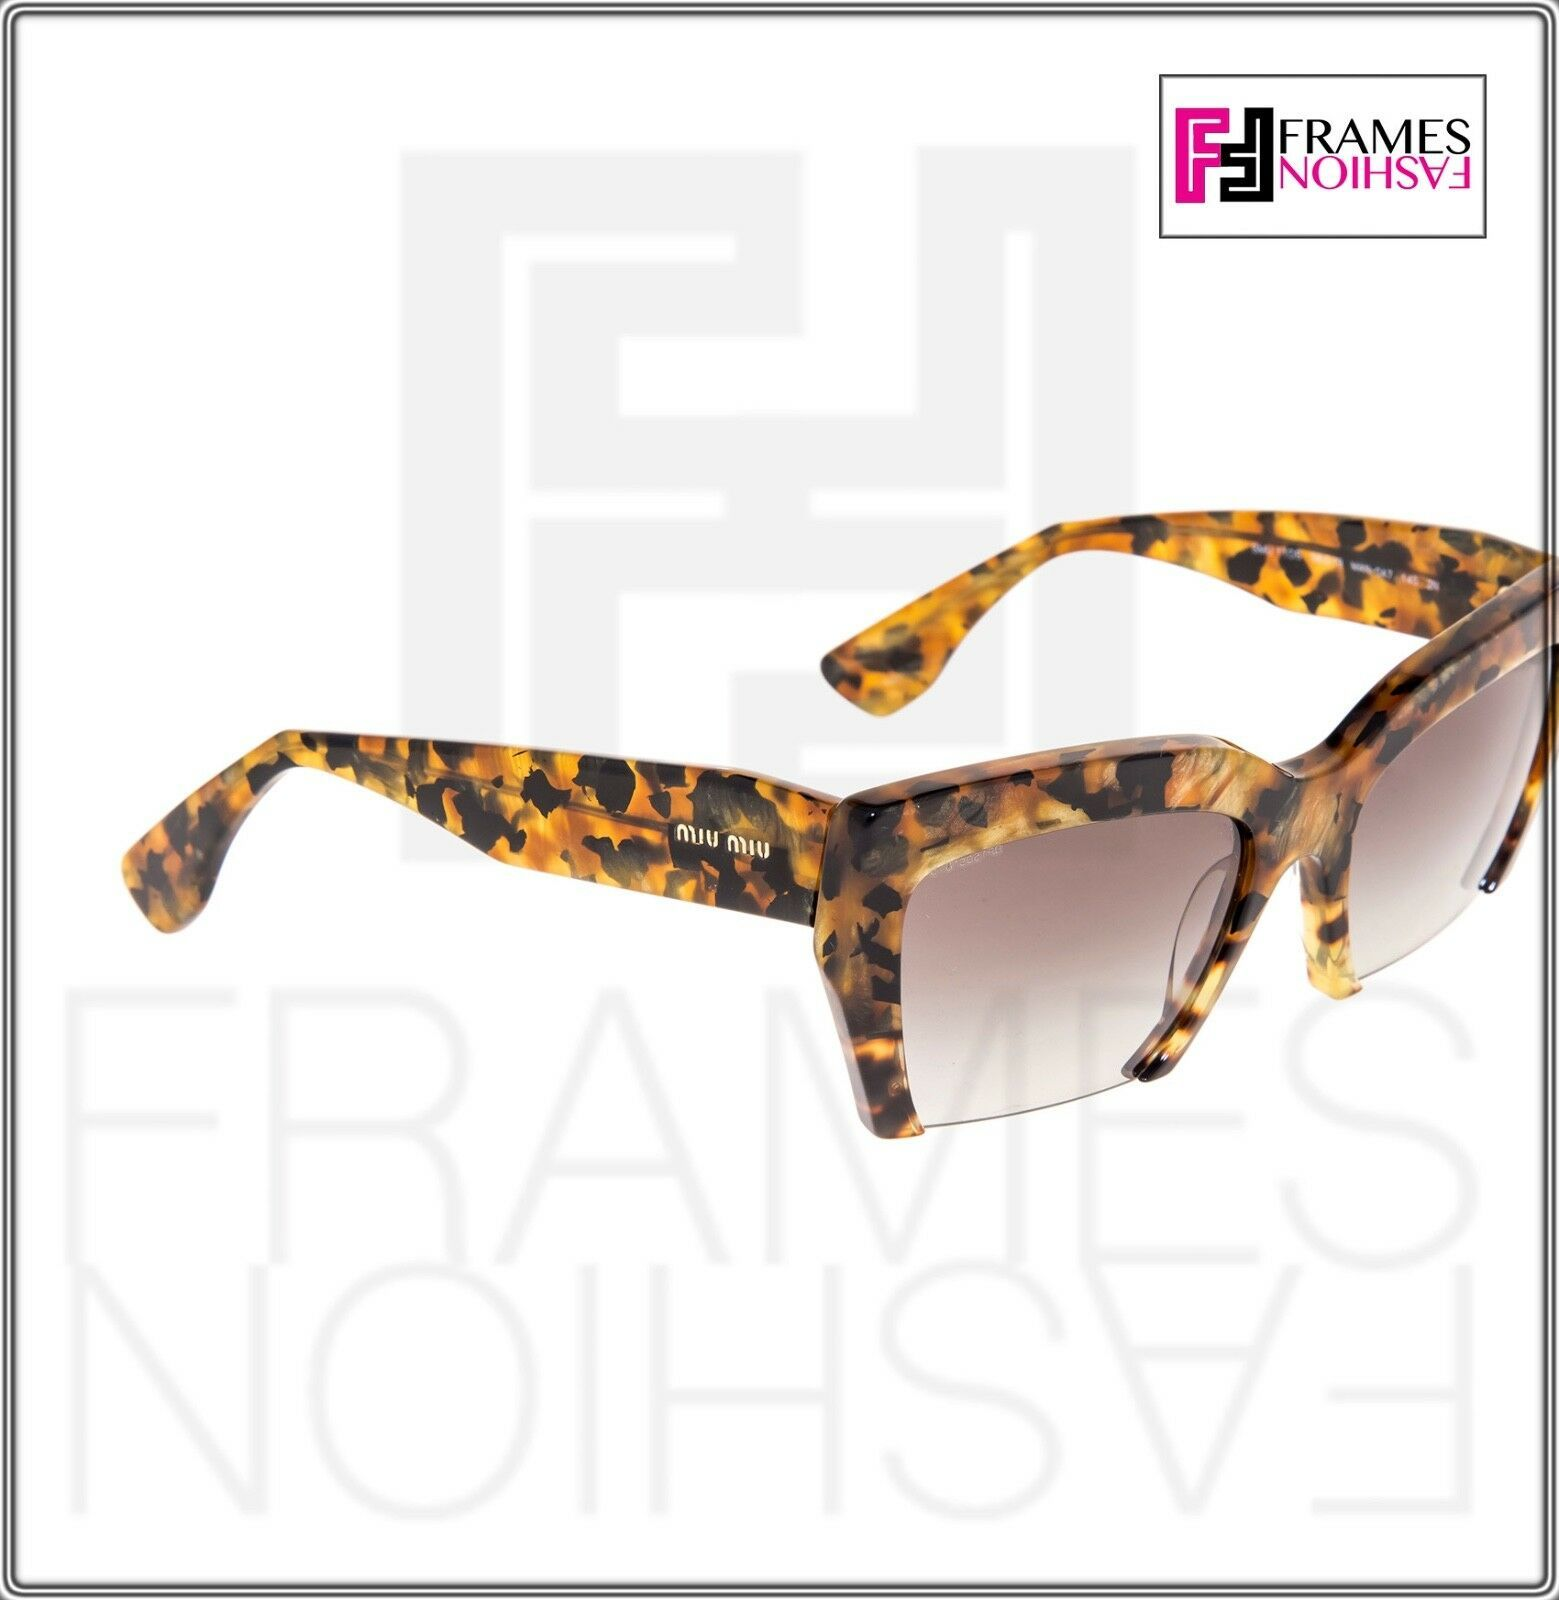 MIU MIU RASOIR 11O Square Sunglasses MAN-0A7 Caramel Marble Sunglasses MU11OS image 5